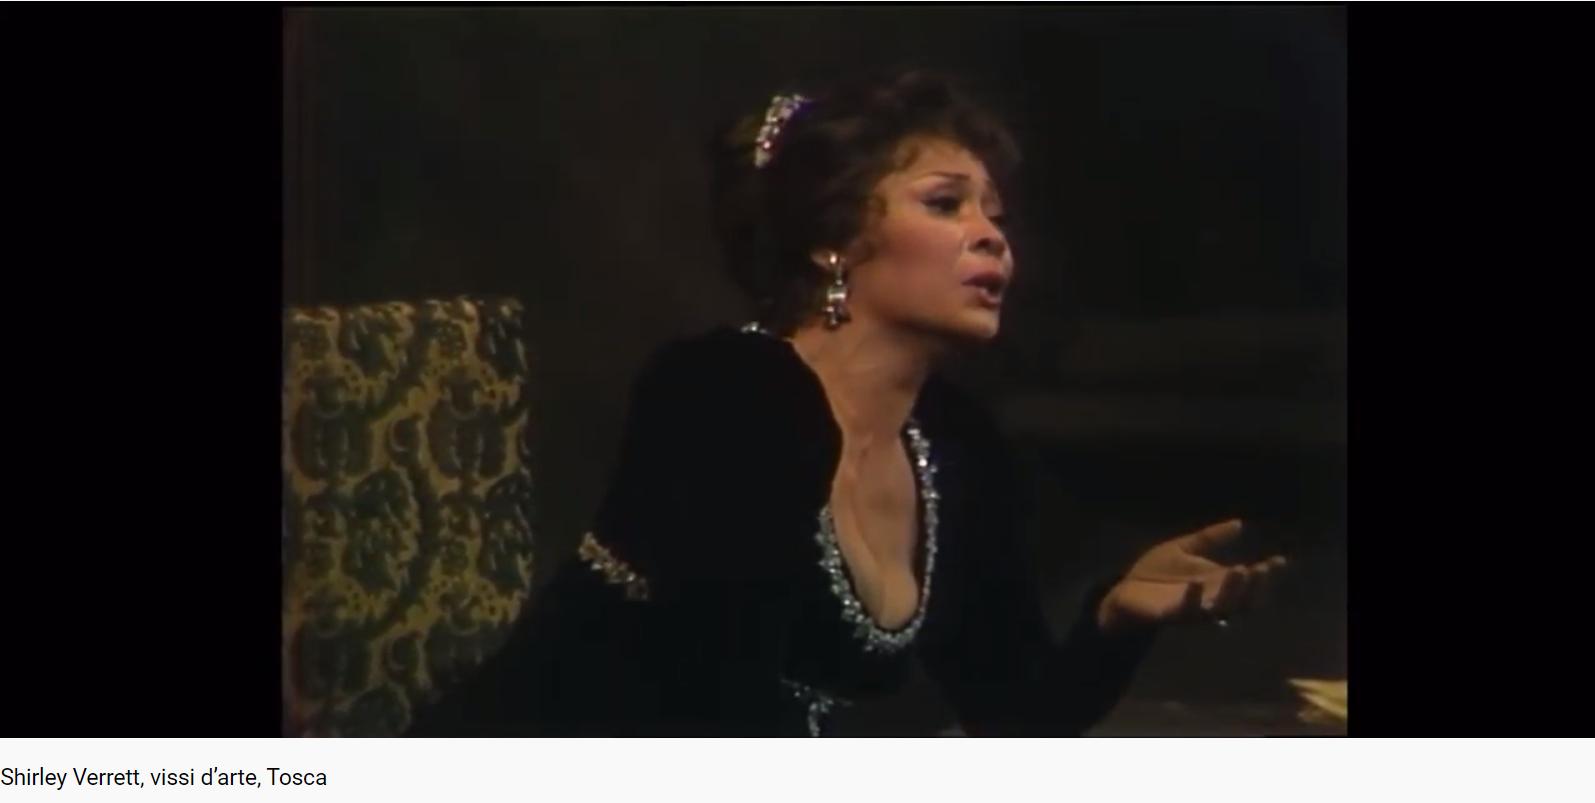 Puccini Tosca Vissi d'arte (MET 1988)